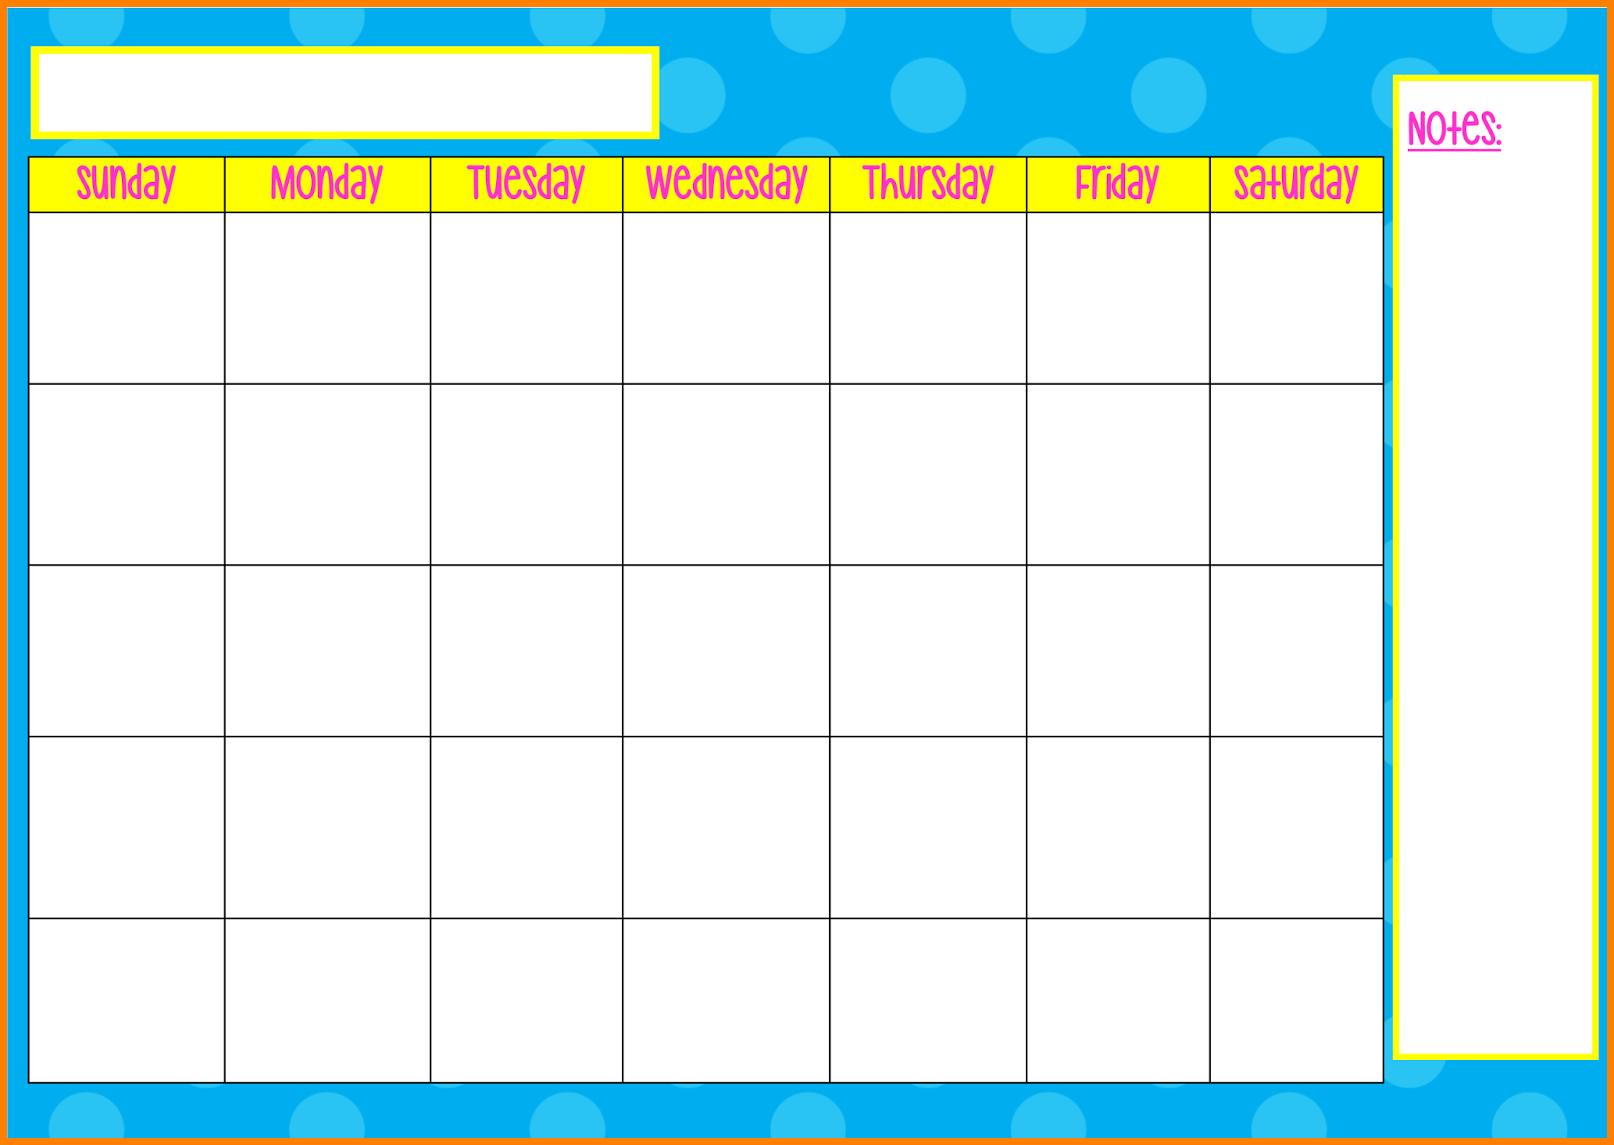 10+ Monday Thru Friday – Card Authorization 2017 Blank Calendar Grid Moday Friday